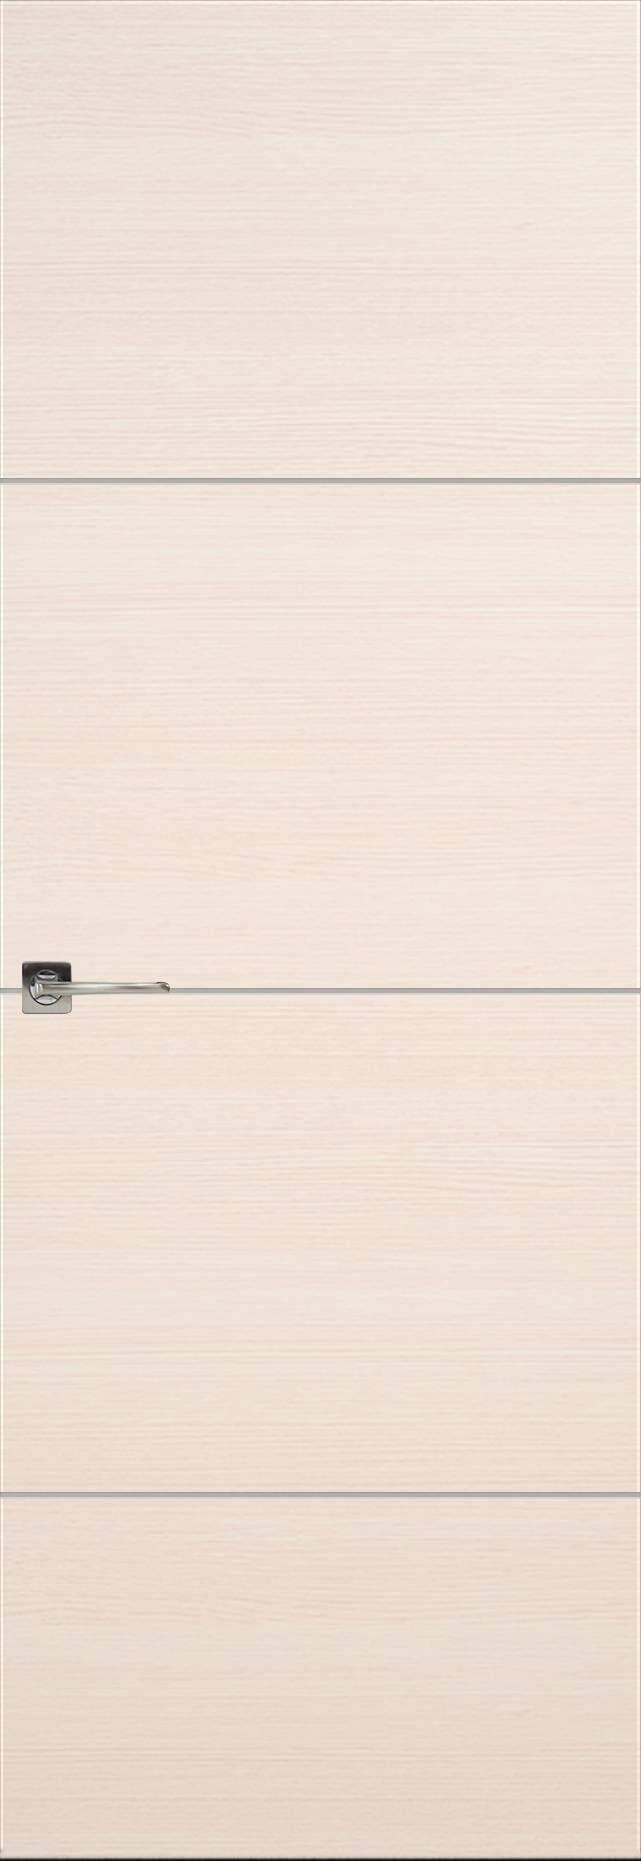 Tivoli Г-2 Invisible цвет - Беленый дуб Без стекла (ДГ)